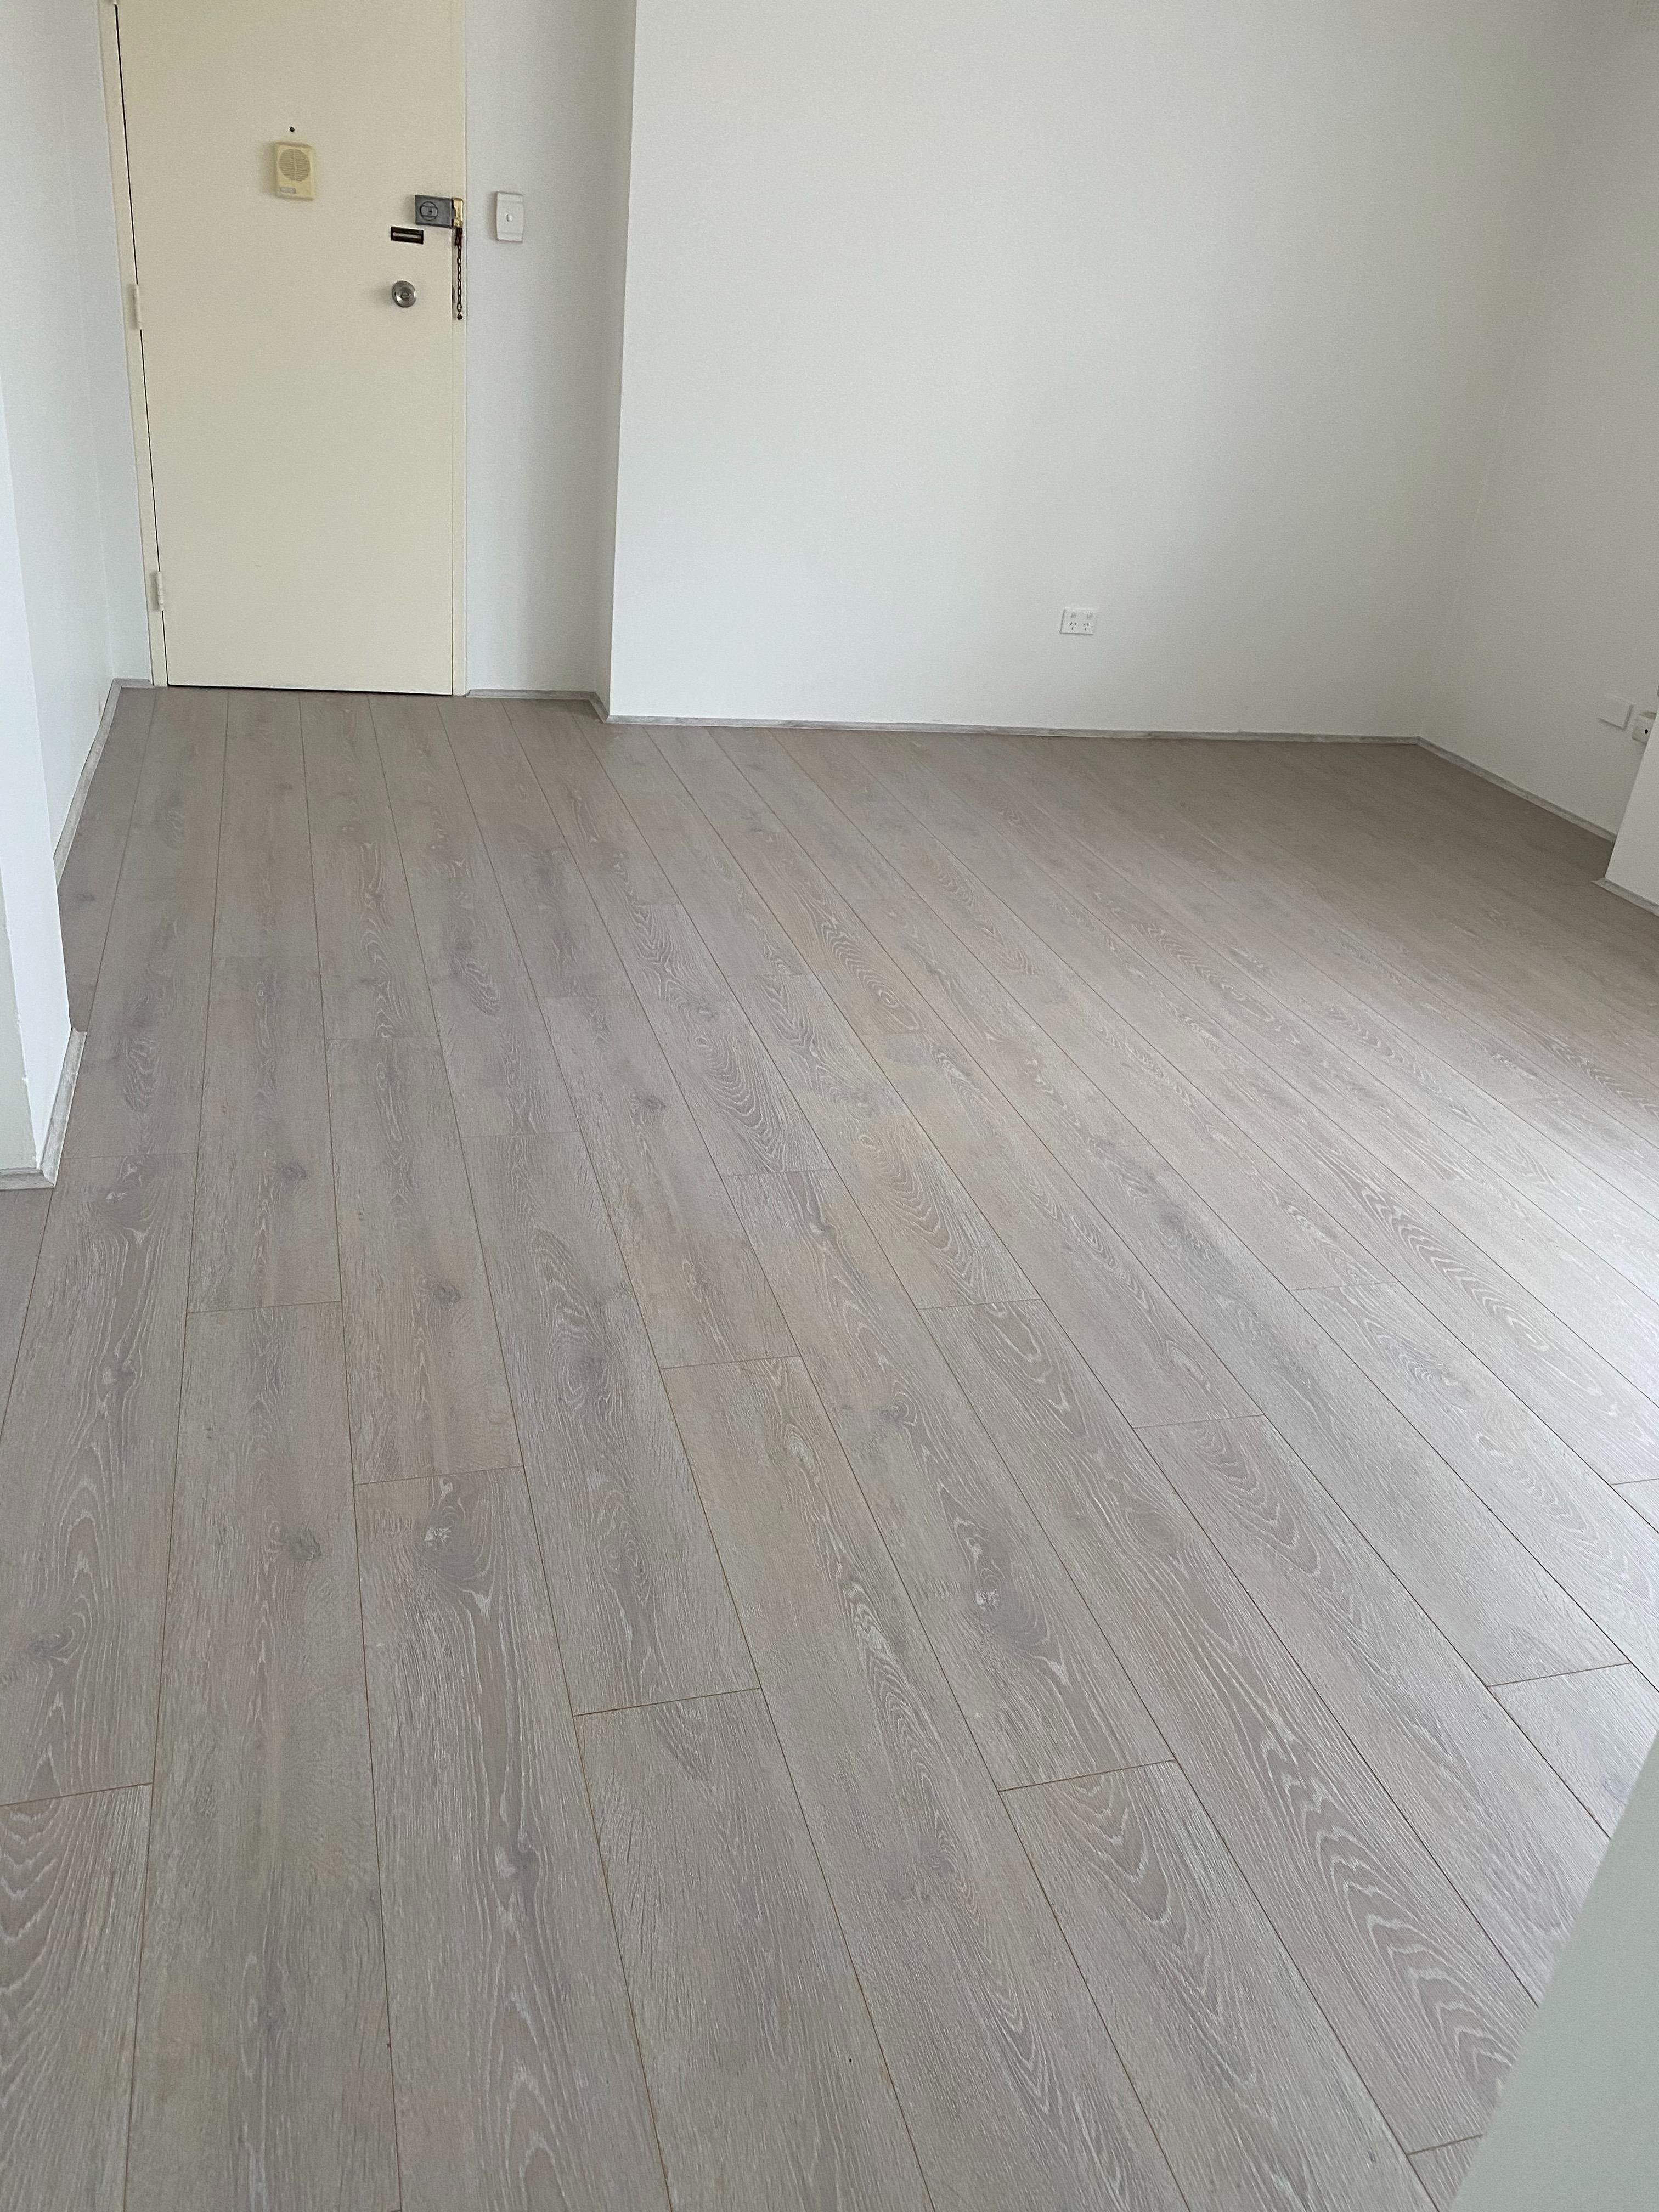 Quality Assured Floor Sanding- Jobs under $3,300    Servicing 40K Radius from Belfield   Our...